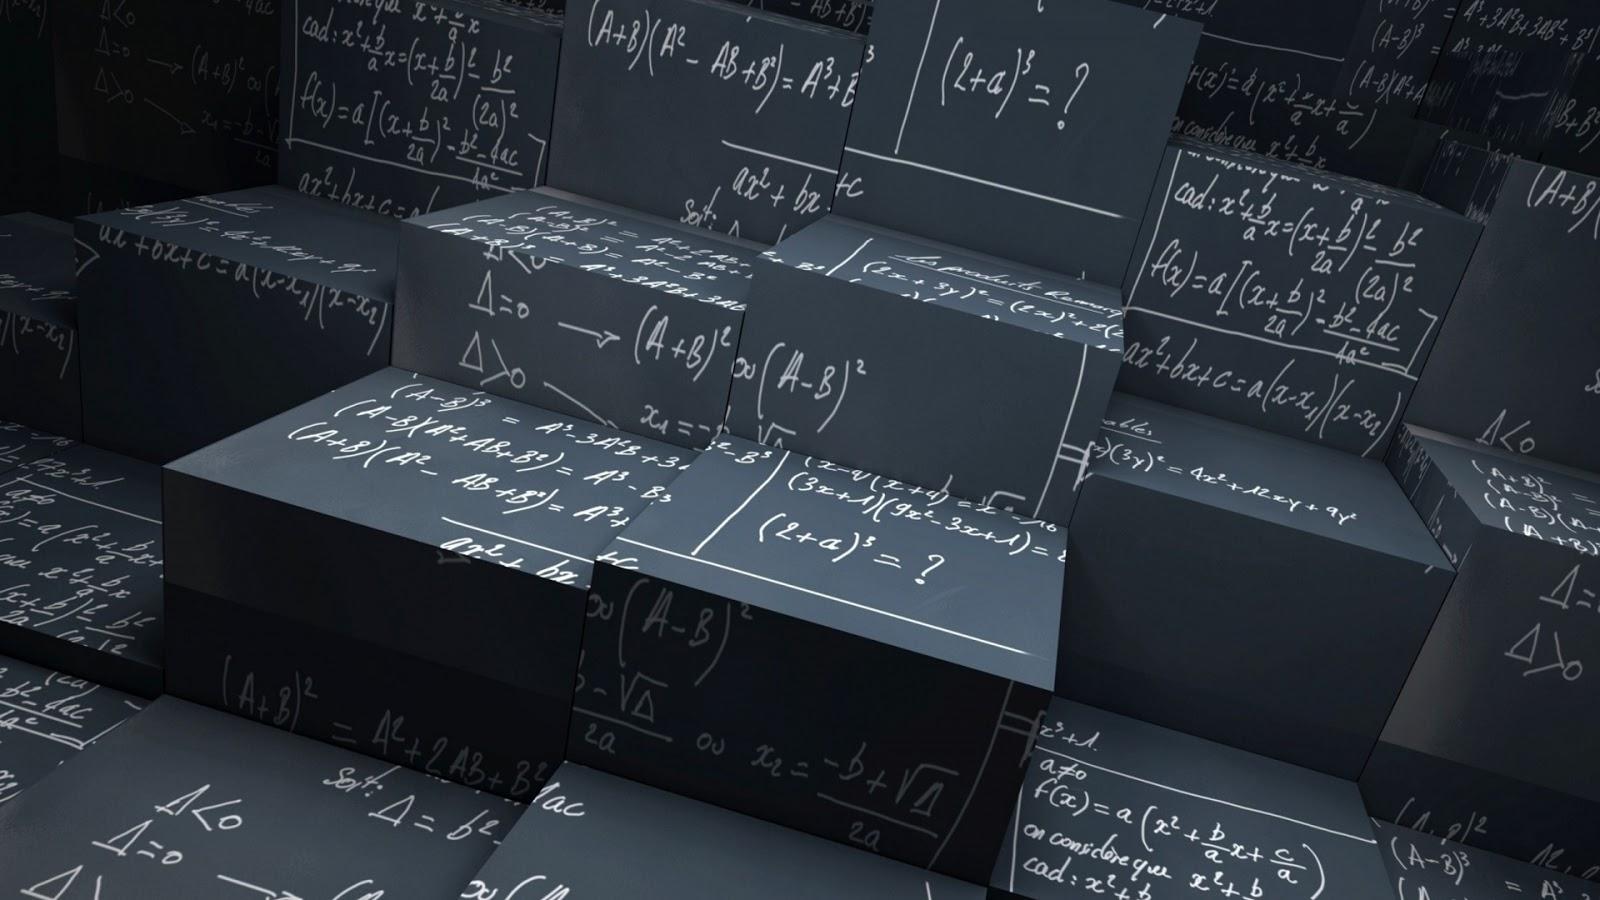 http://4.bp.blogspot.com/-R5oB_reOVmA/UHg4eRDTCBI/AAAAAAAAGrM/8l5EeSHwGkE/s1600/Math_Wallpaper_5.jpg